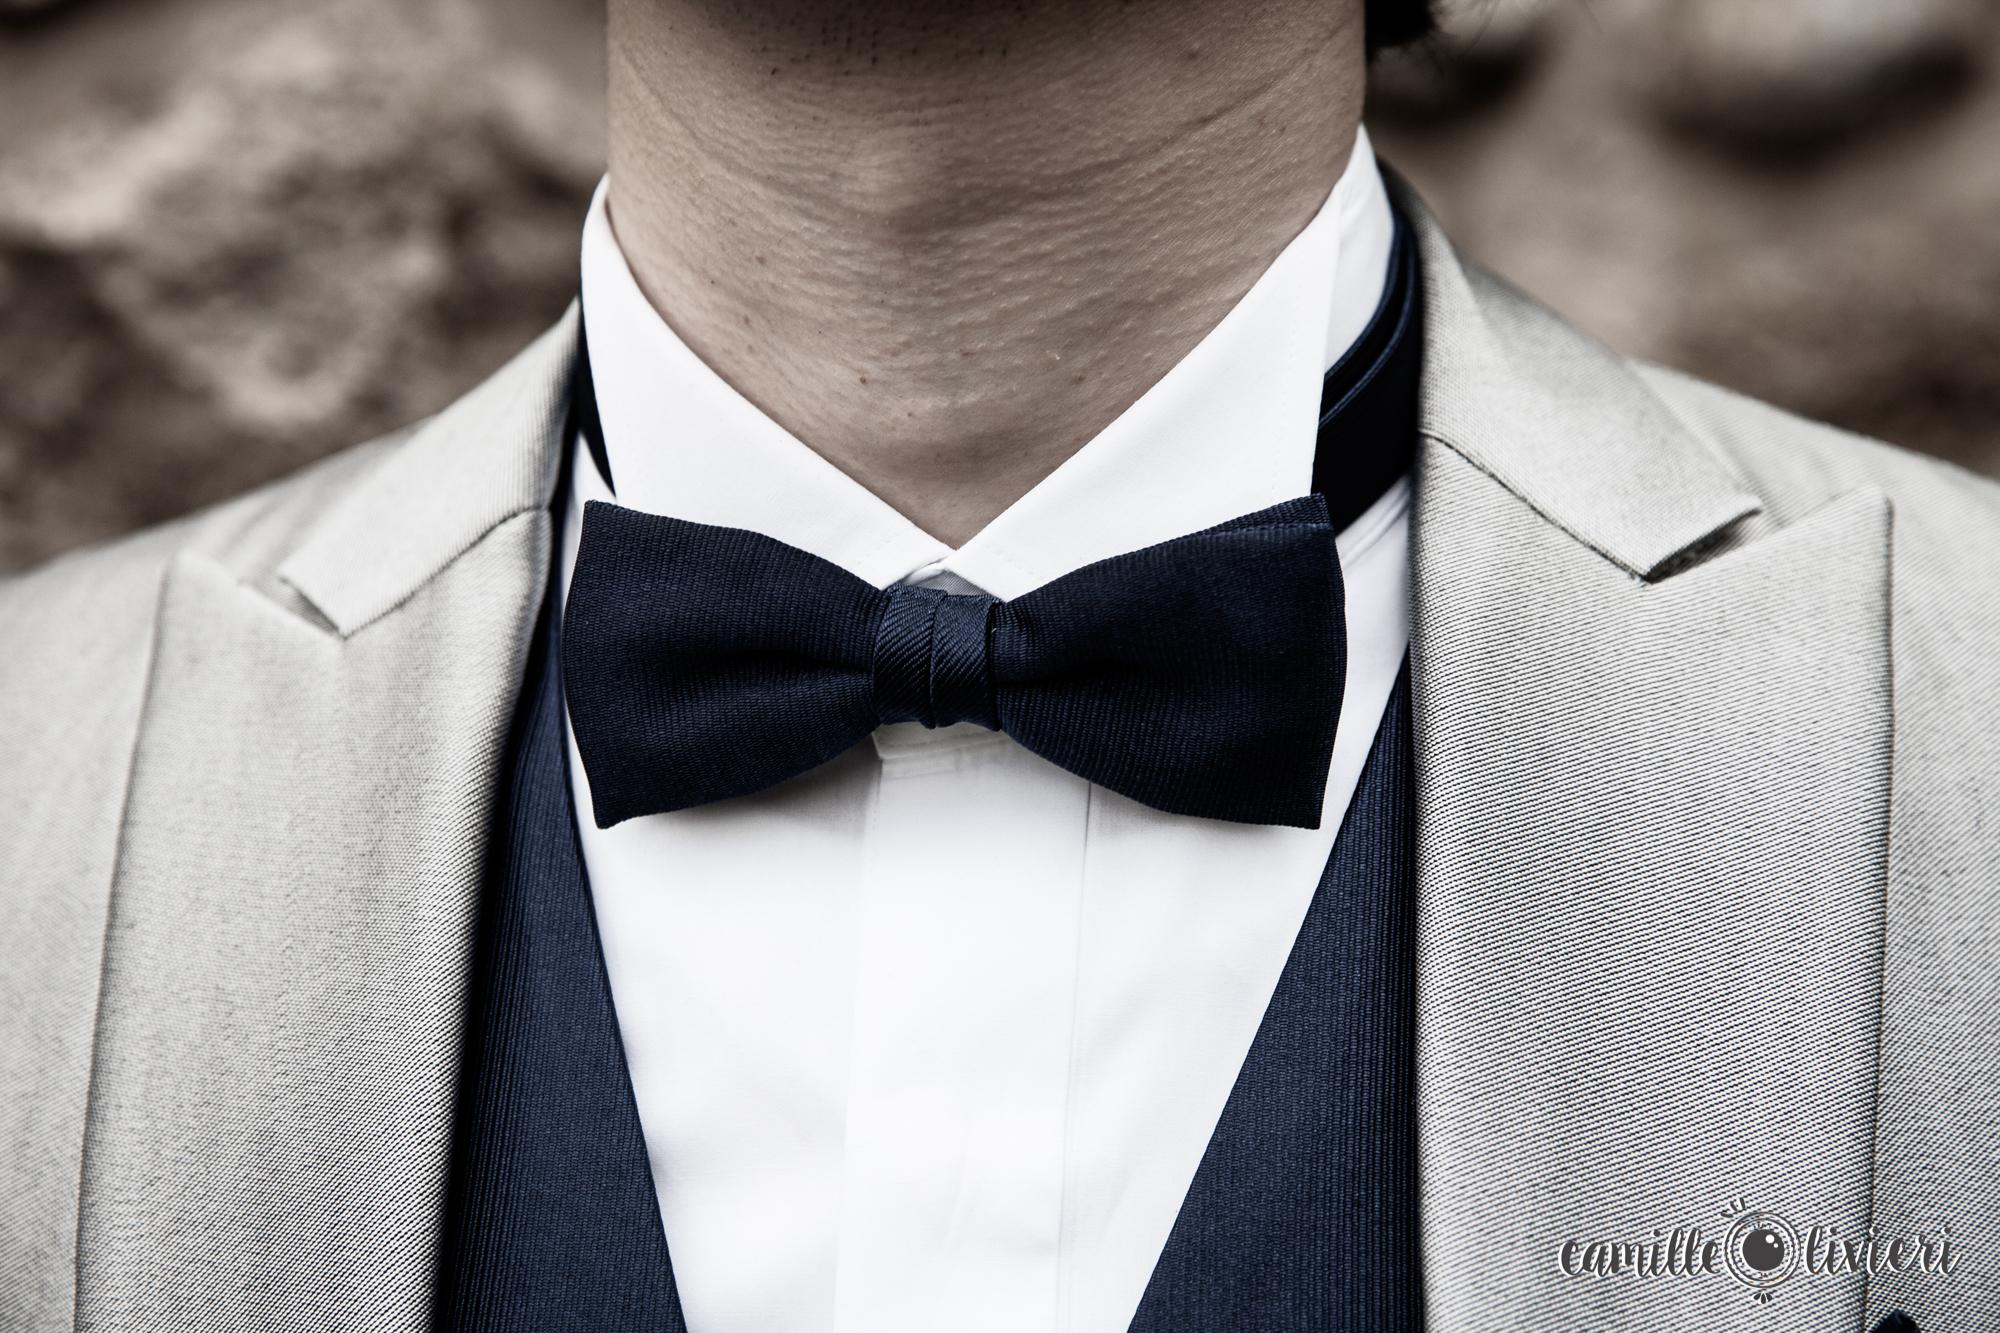 photographe_grenoble_mariage-camille-olivieri-43